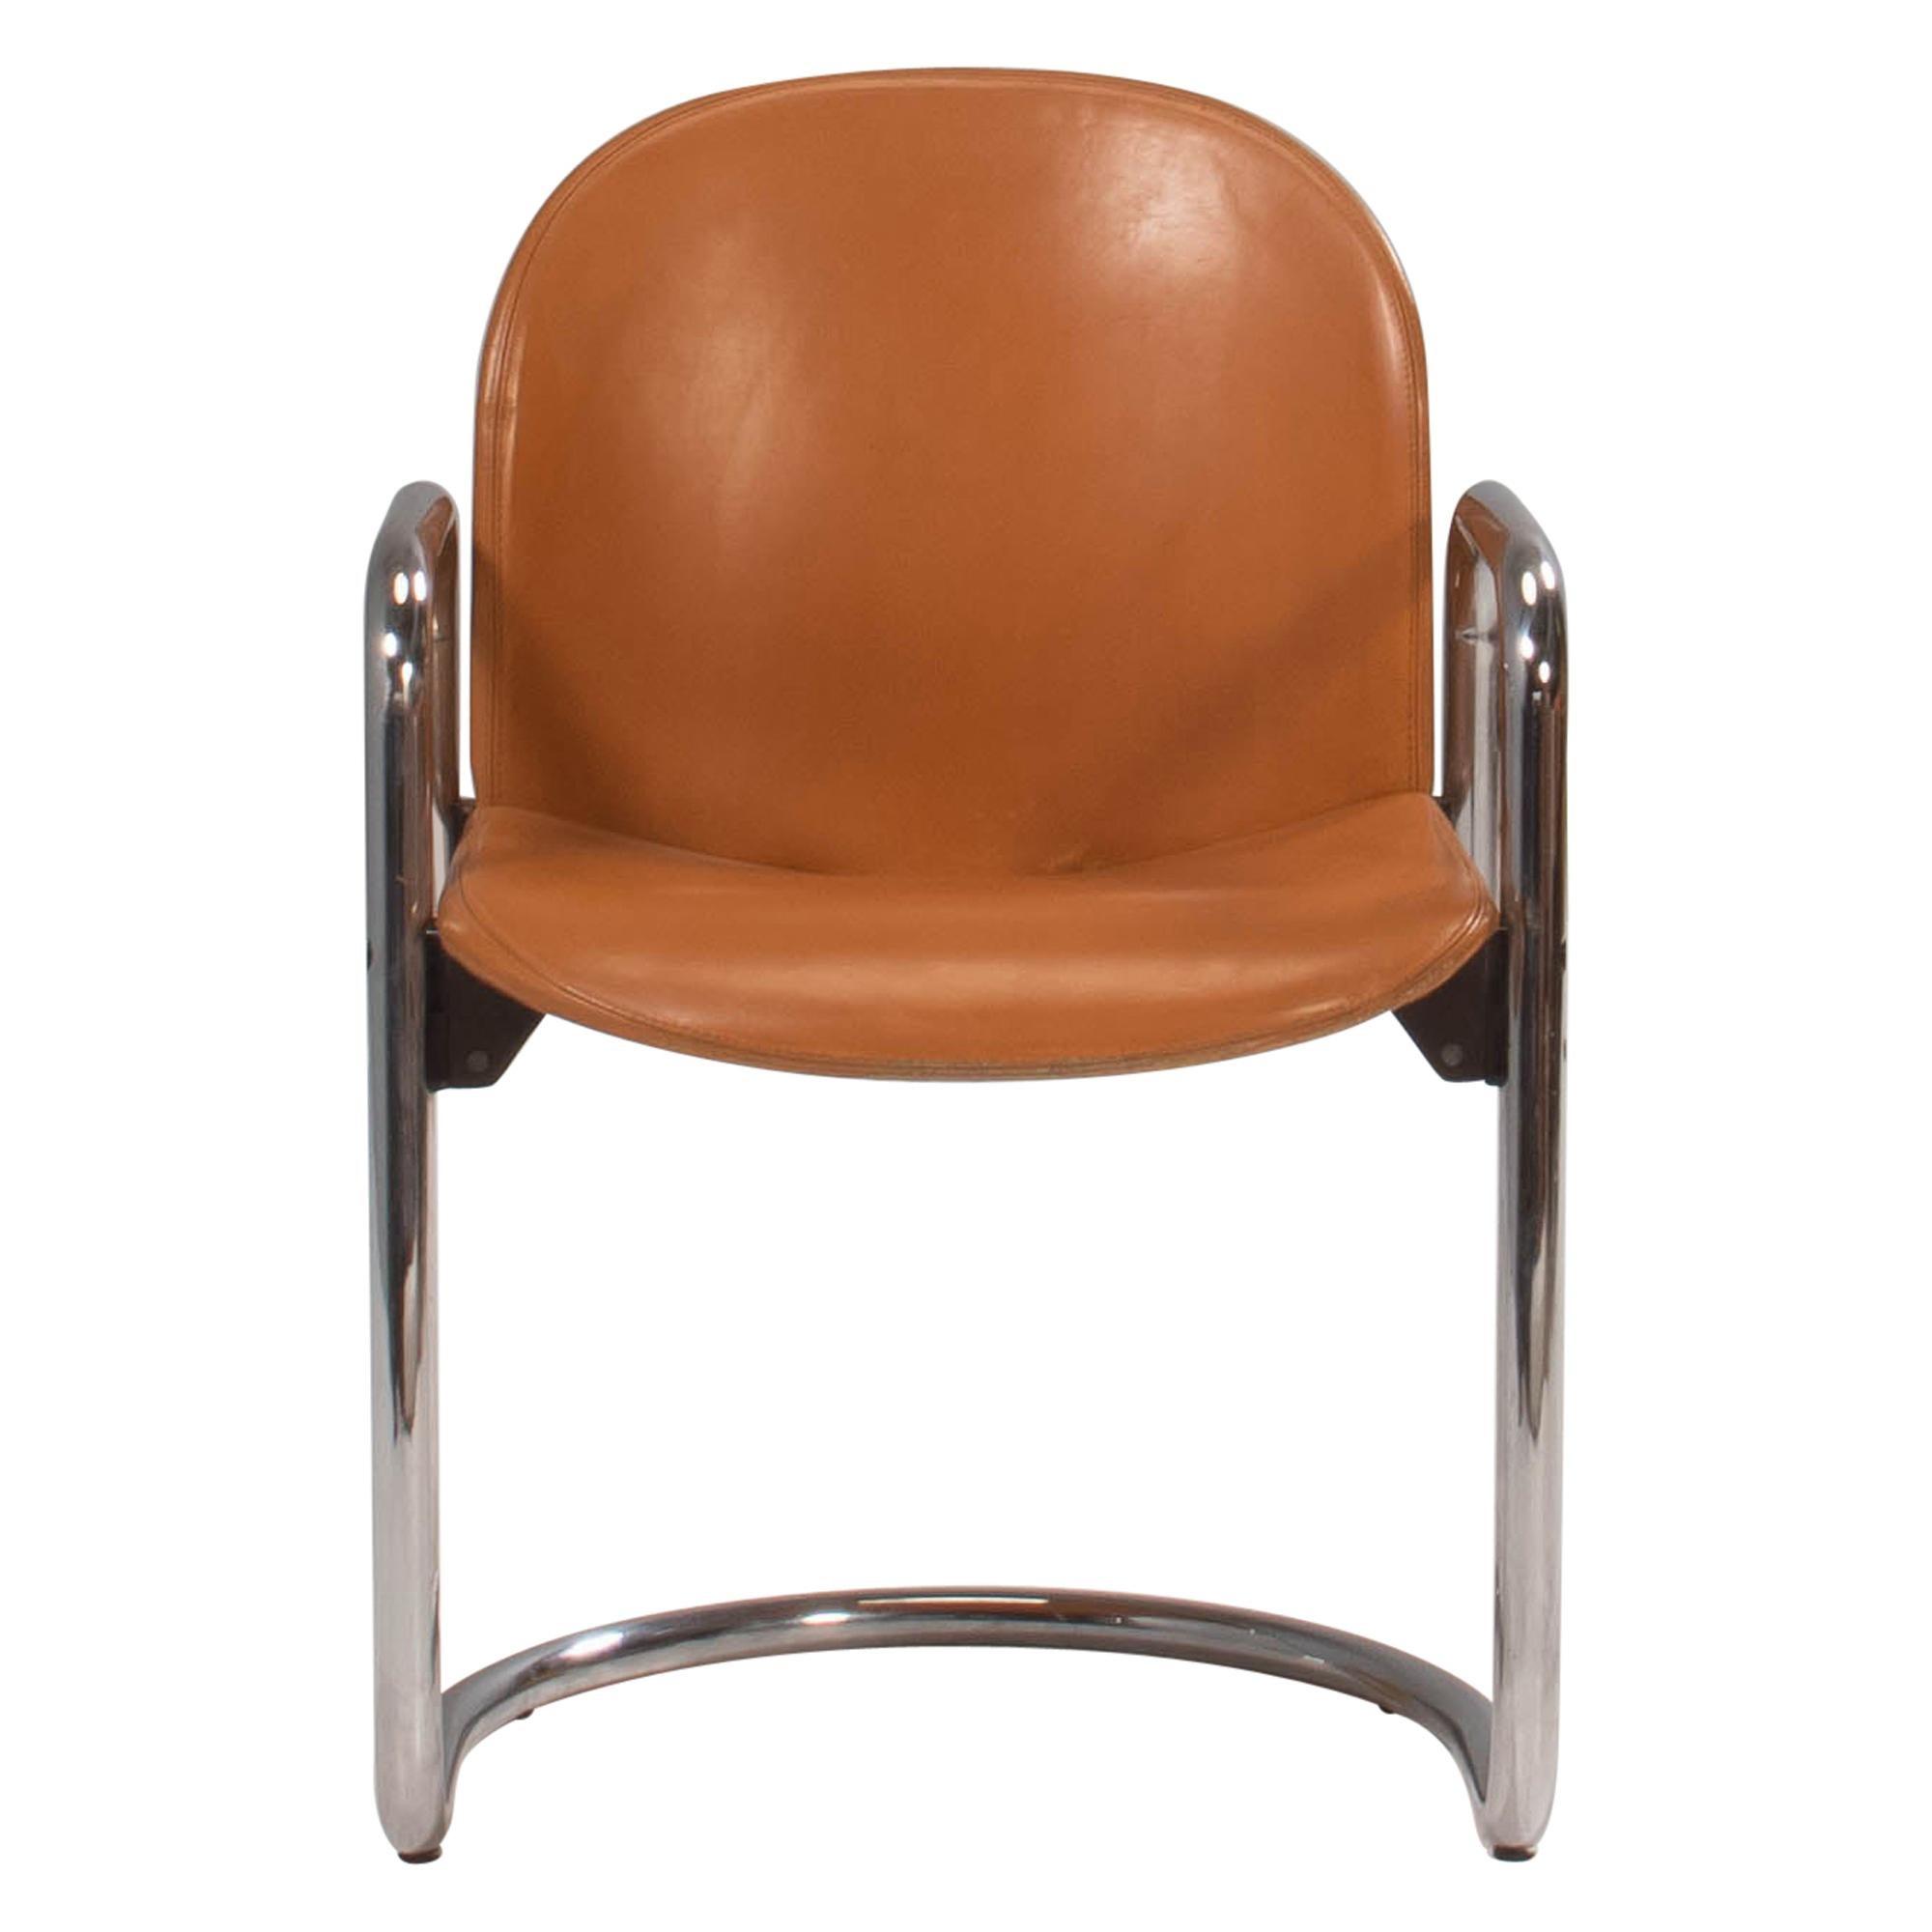 1970's Afra & Tobia Scarpa for B&B Italia Dialogo Dining Chair